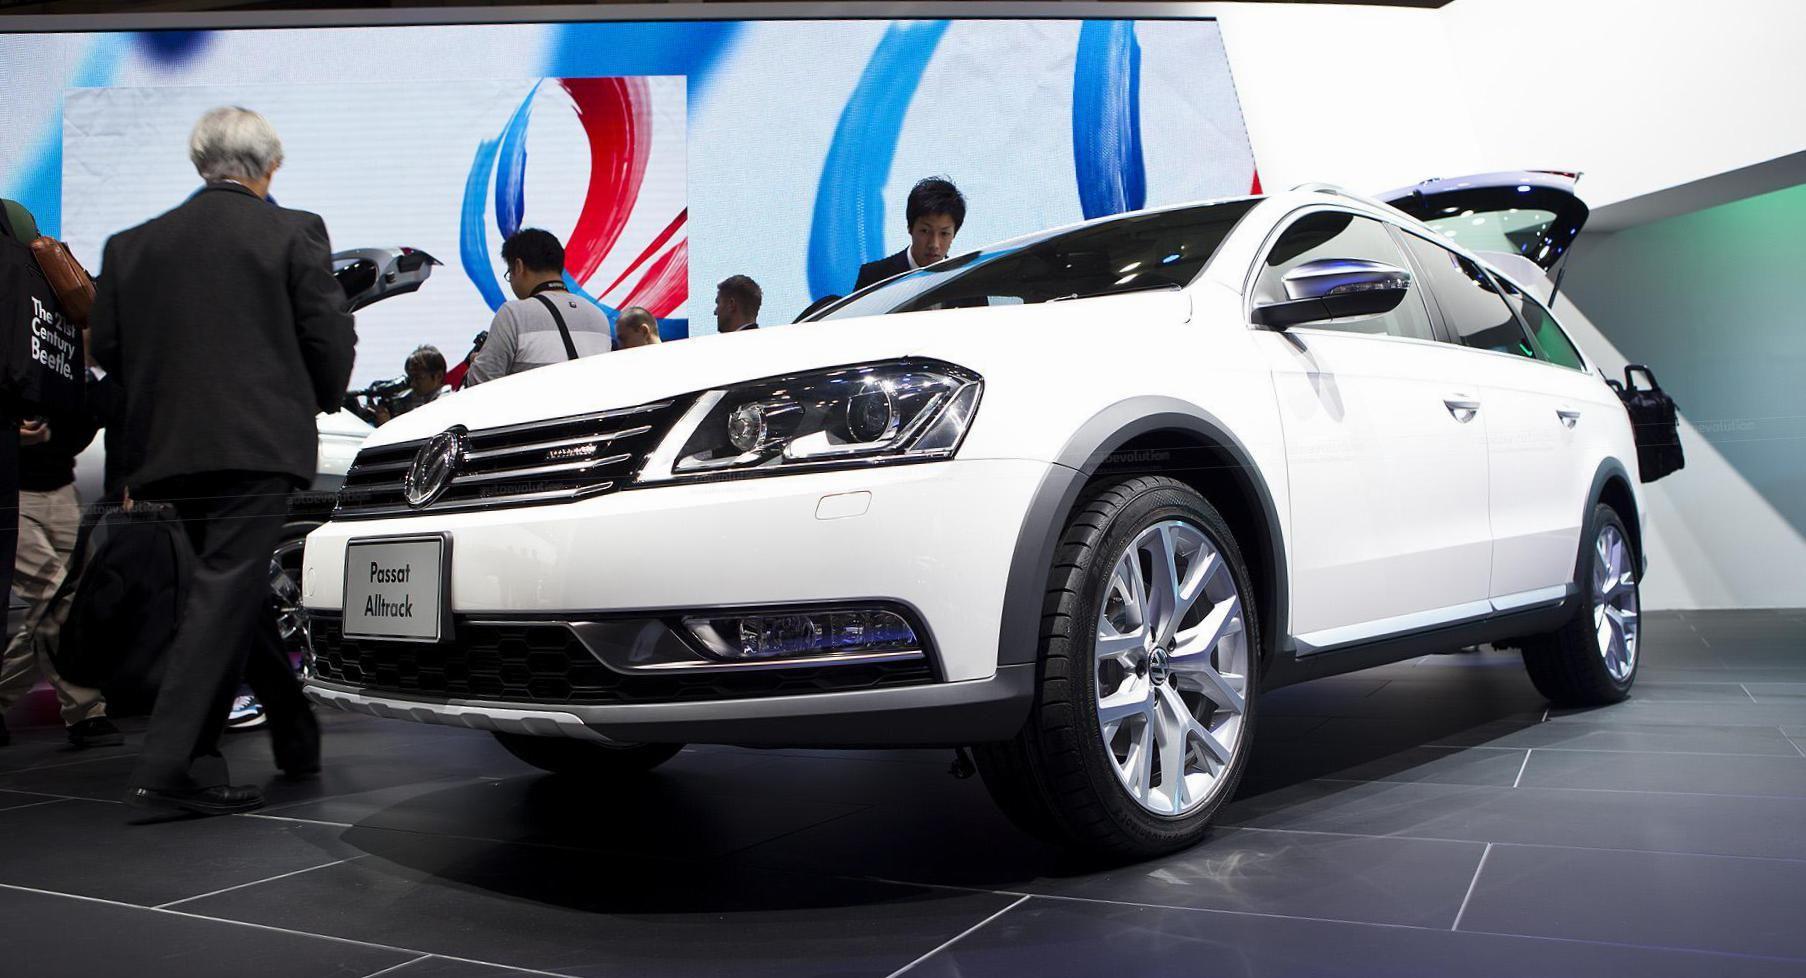 Volkswagen Passat Alltrack new - http://autotras.com